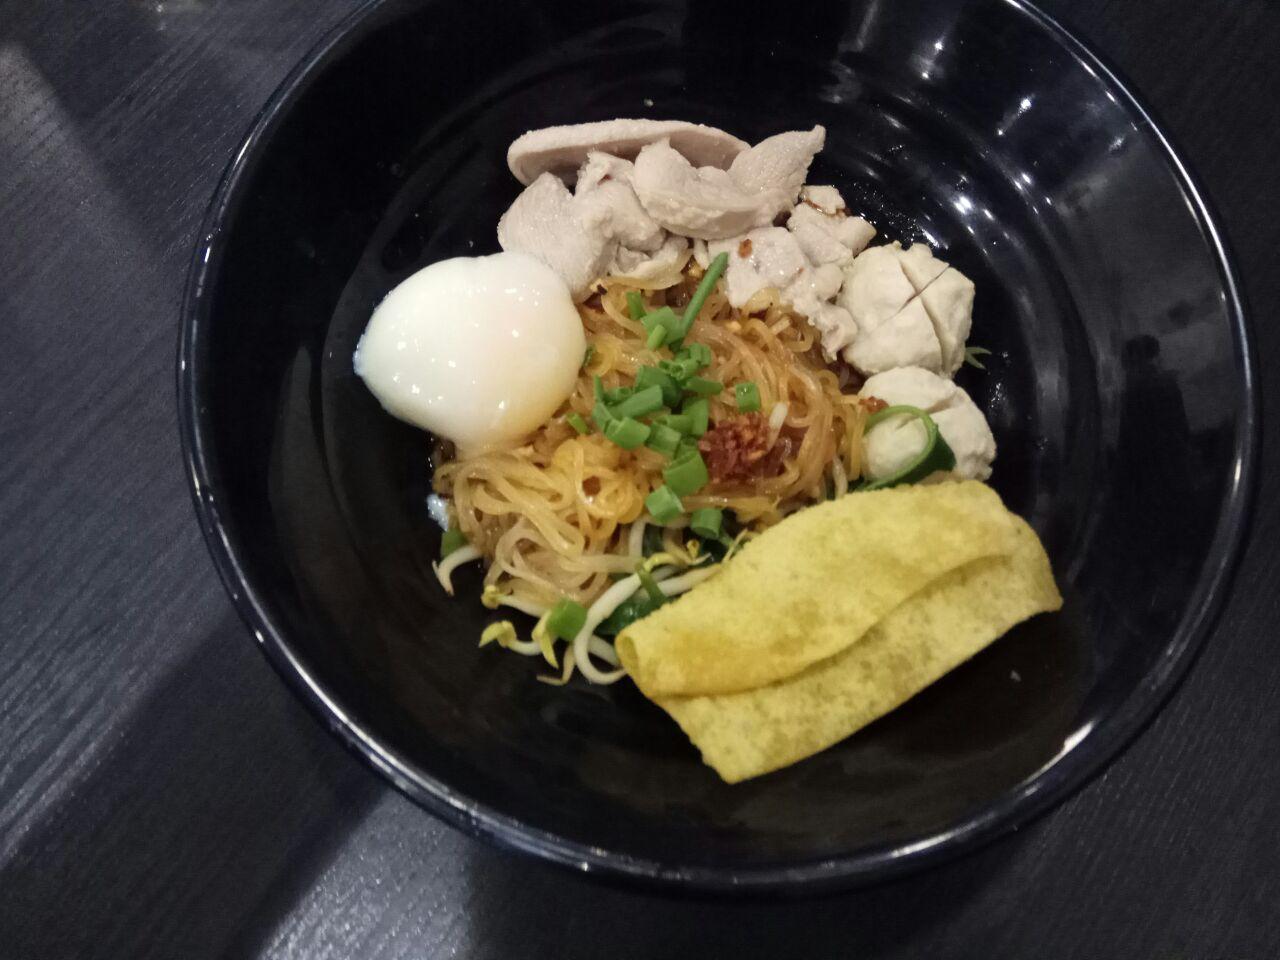 Spicy Noodles Dry 5.9nett